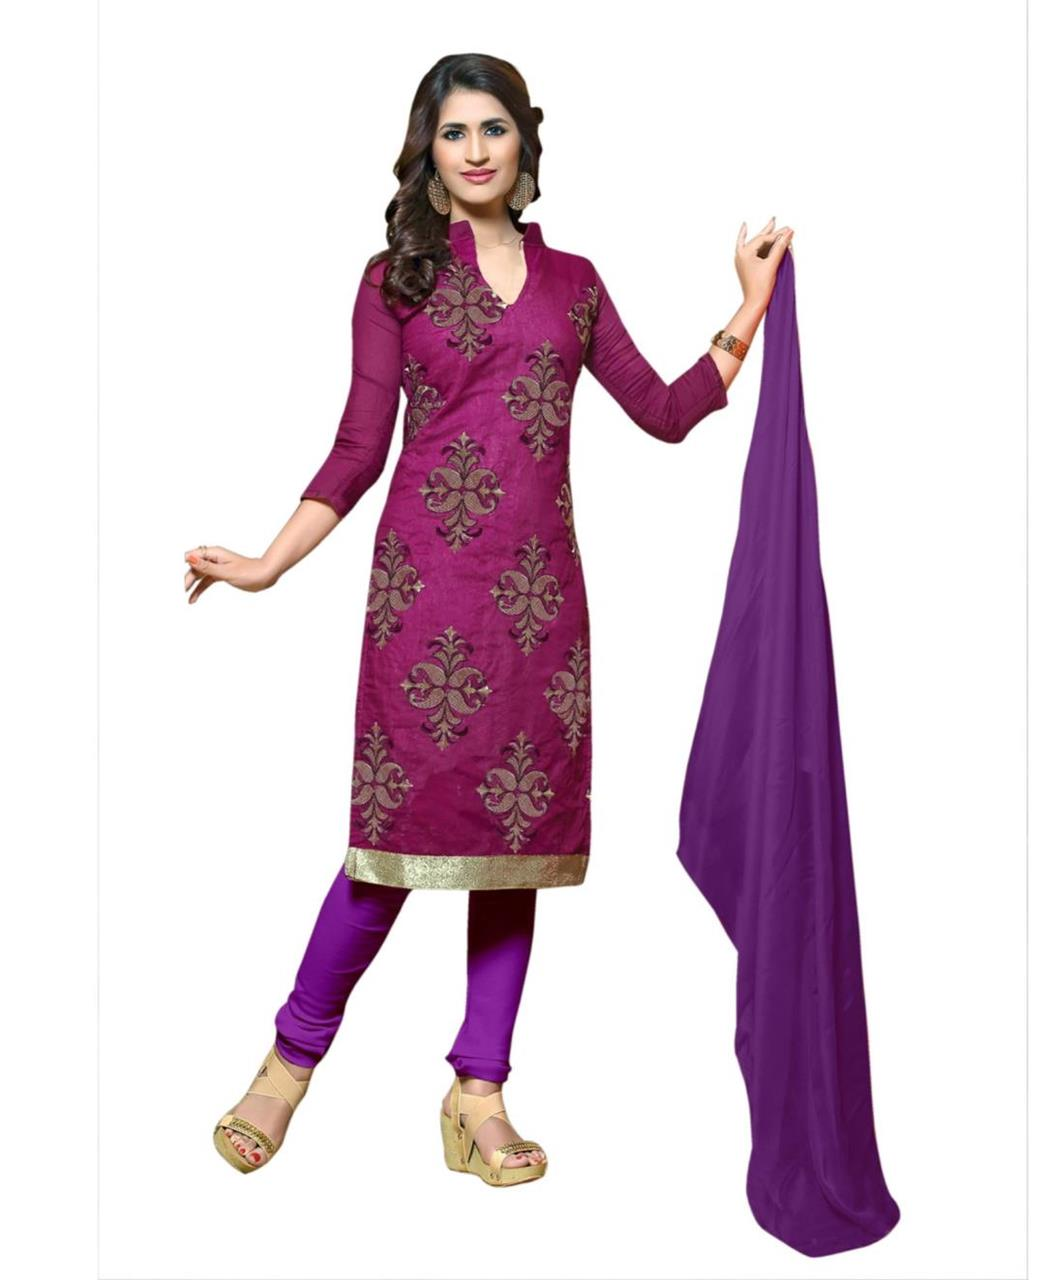 Cotton Straight cut Salwar Kameez in Violet